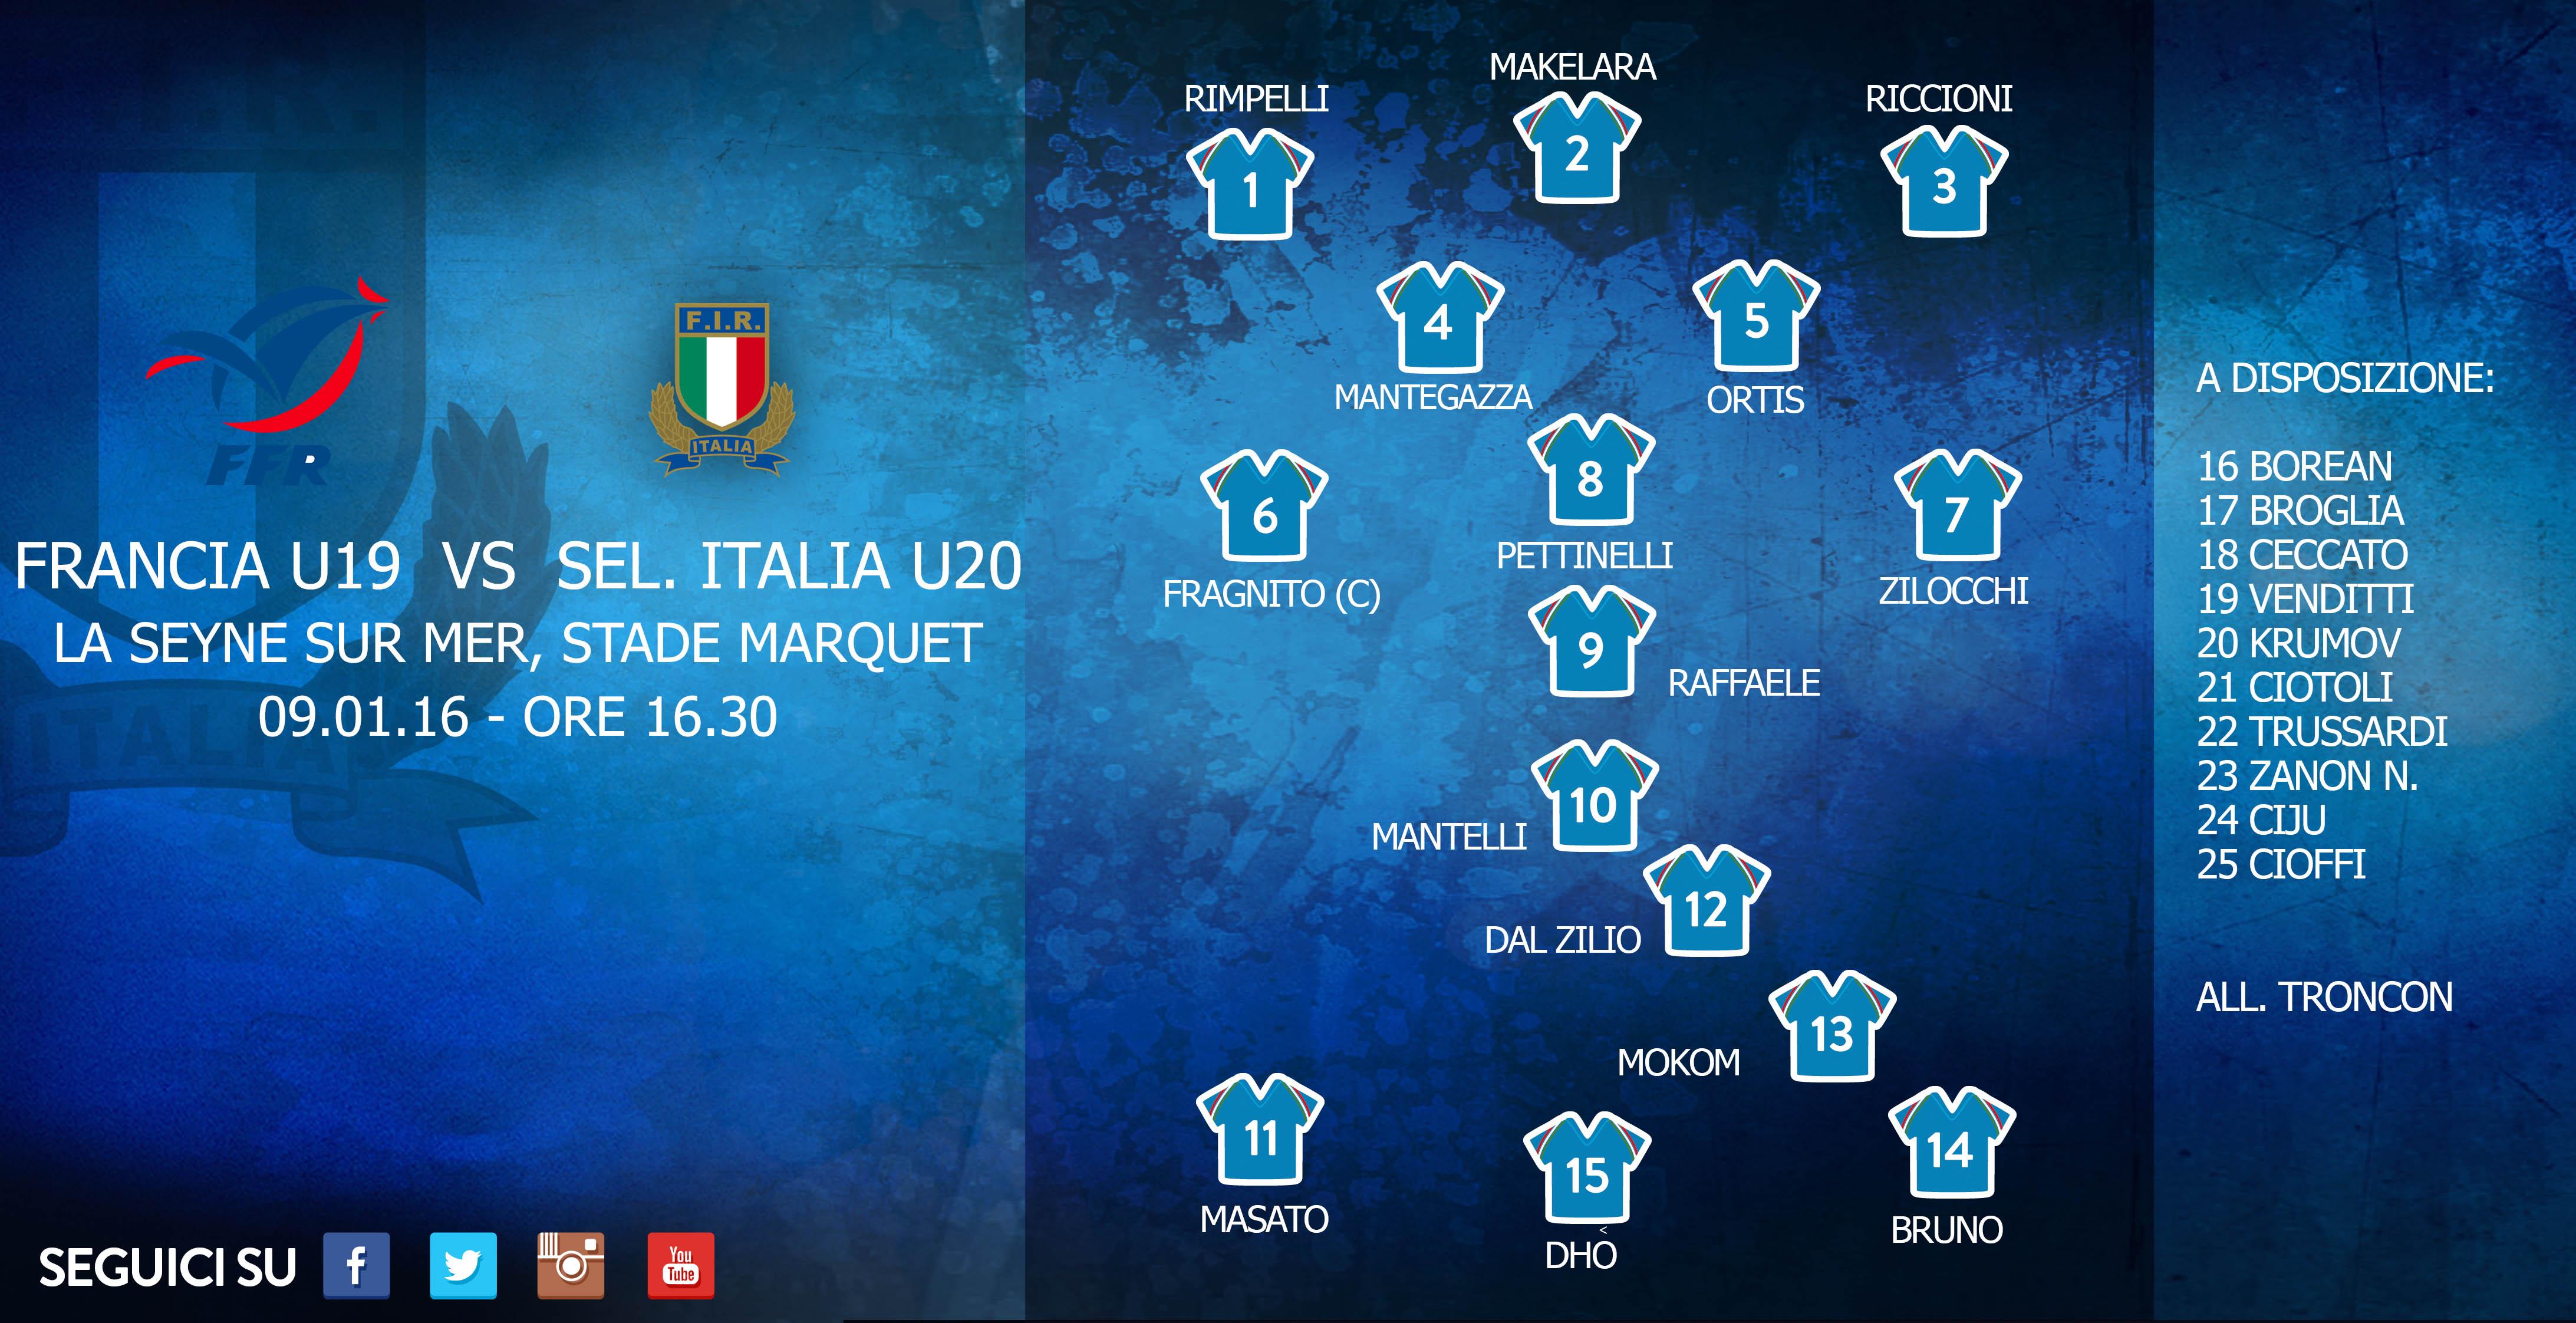 Sel. Italia u20